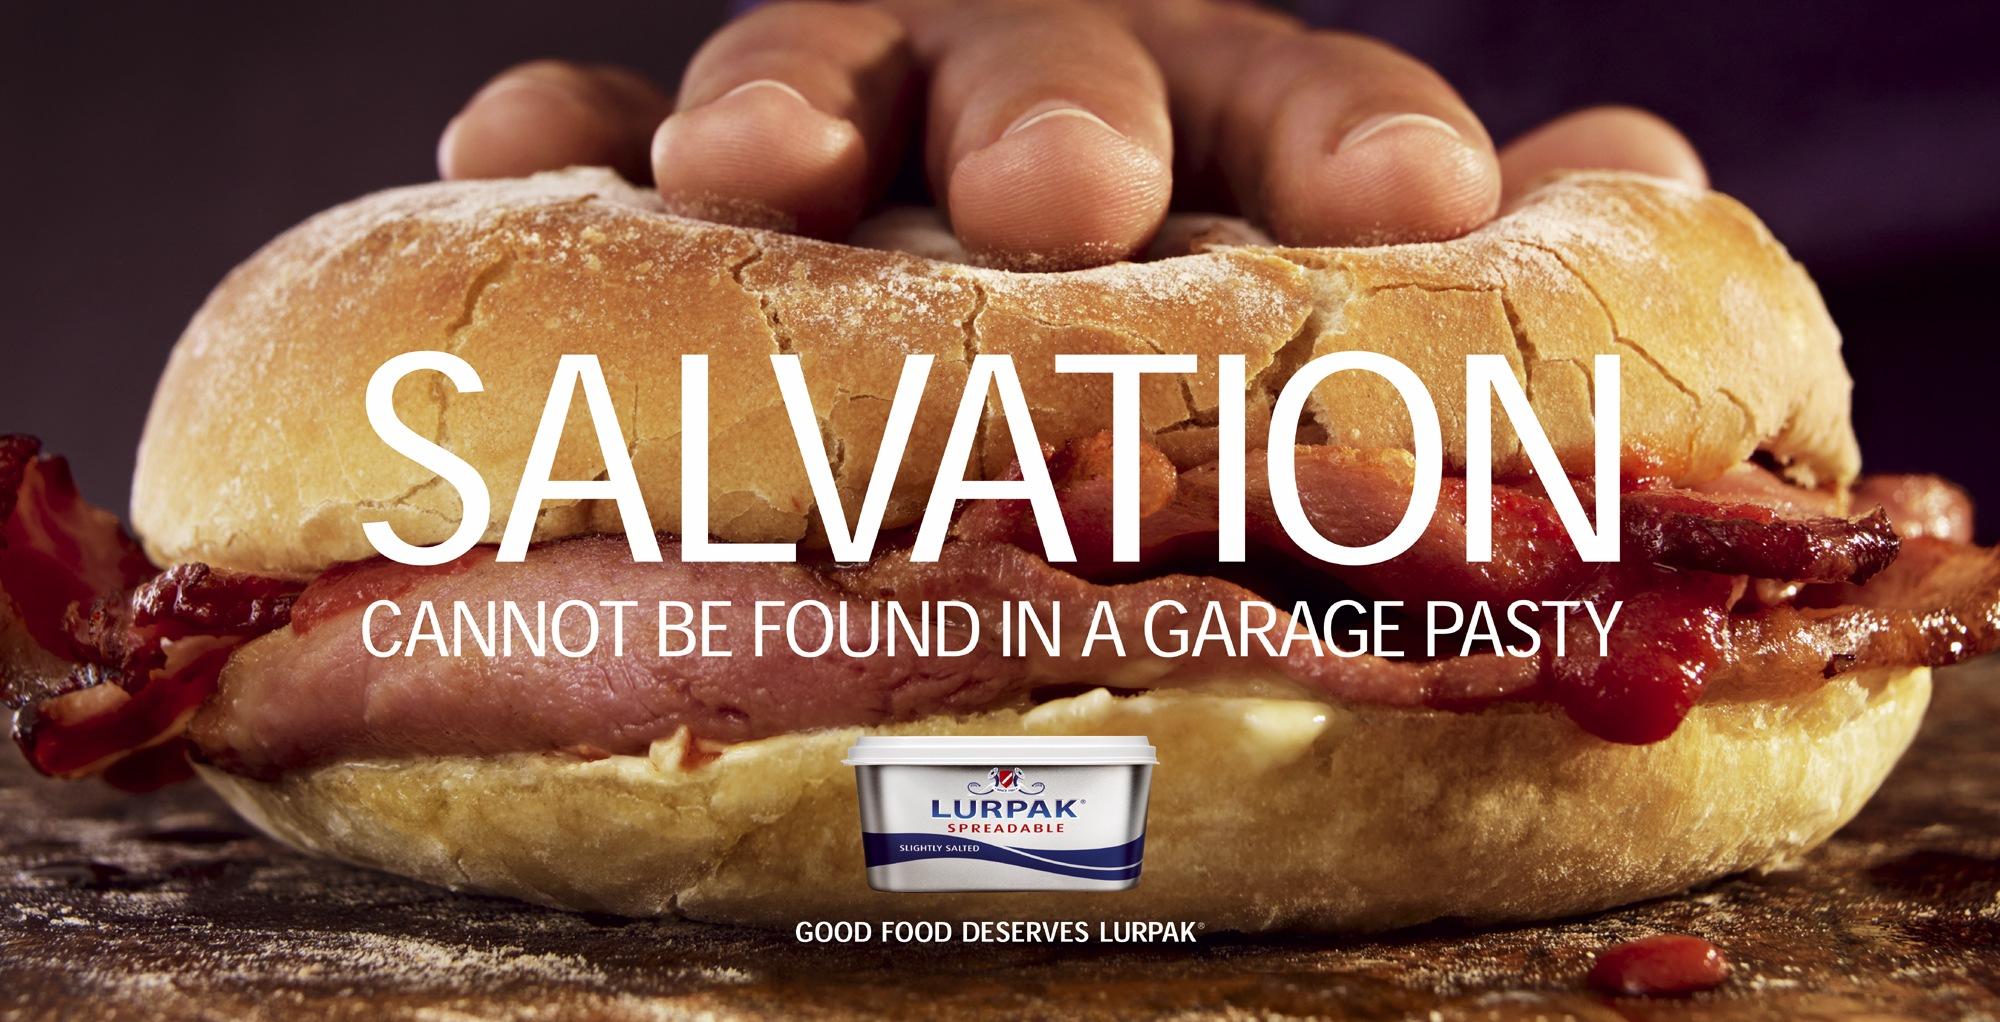 Nadege_Lurpak_Salvation